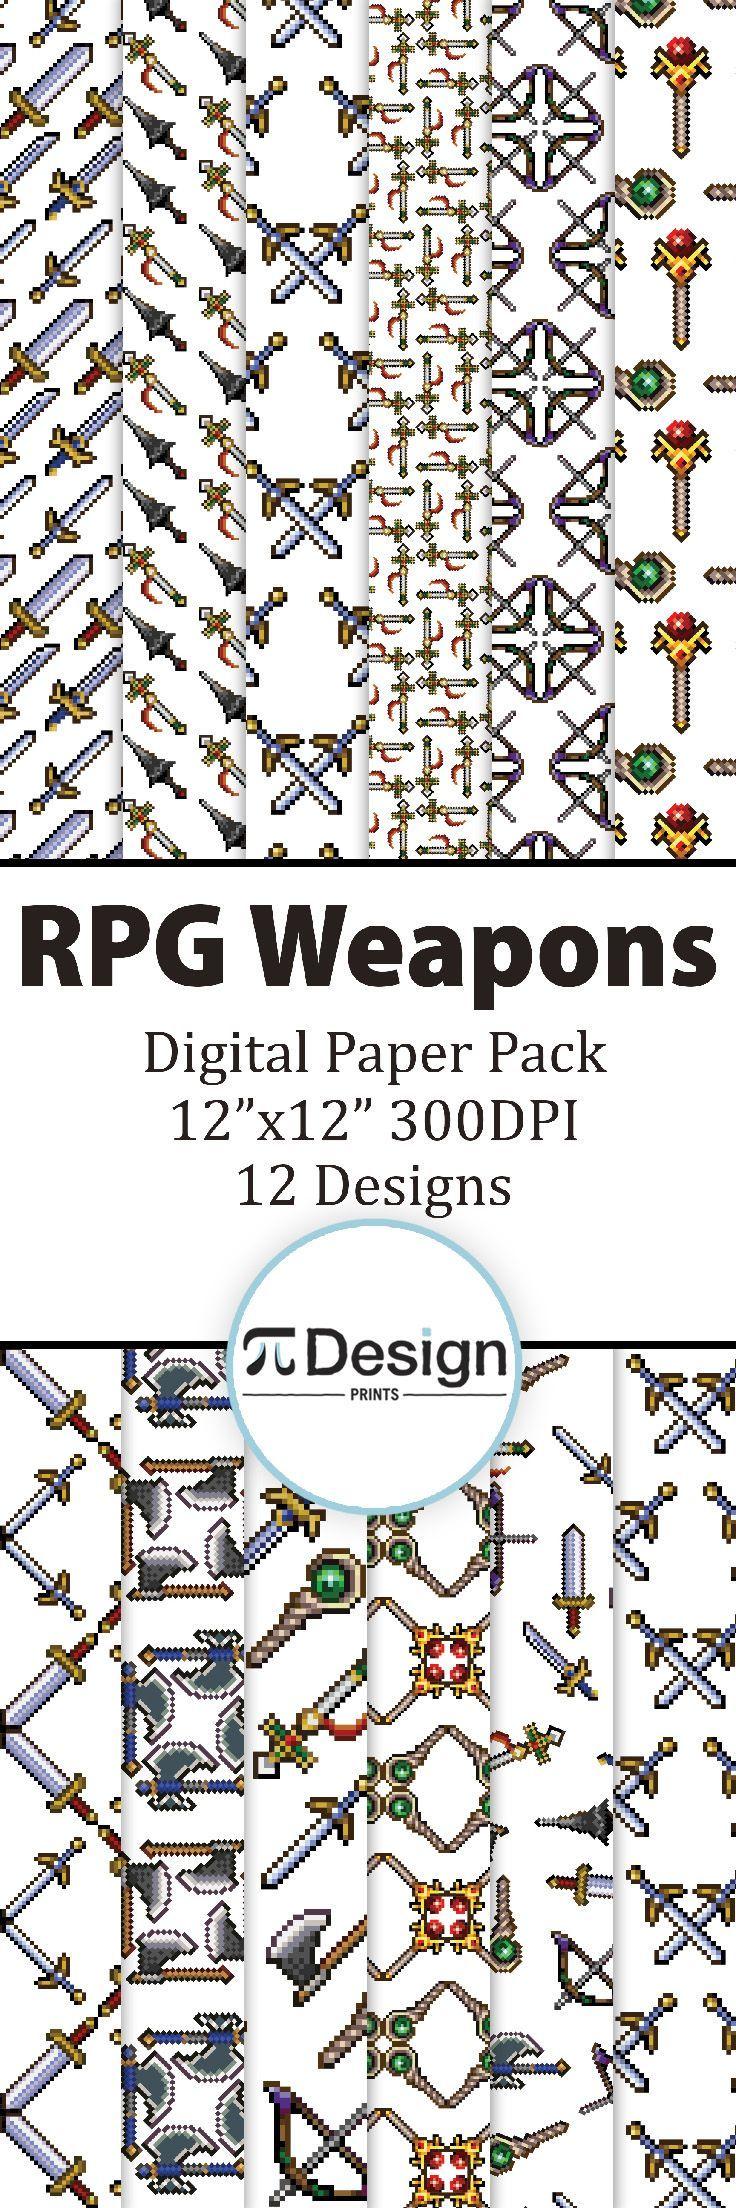 "Pixel Weapons 12""x12"" Digital Paper Pack 0f 12 | Video Game Digital Paper | Retro Video Game Pixel Pattern | Geeky Scrapbooking | DIY Gamer by Pi Design Prints"